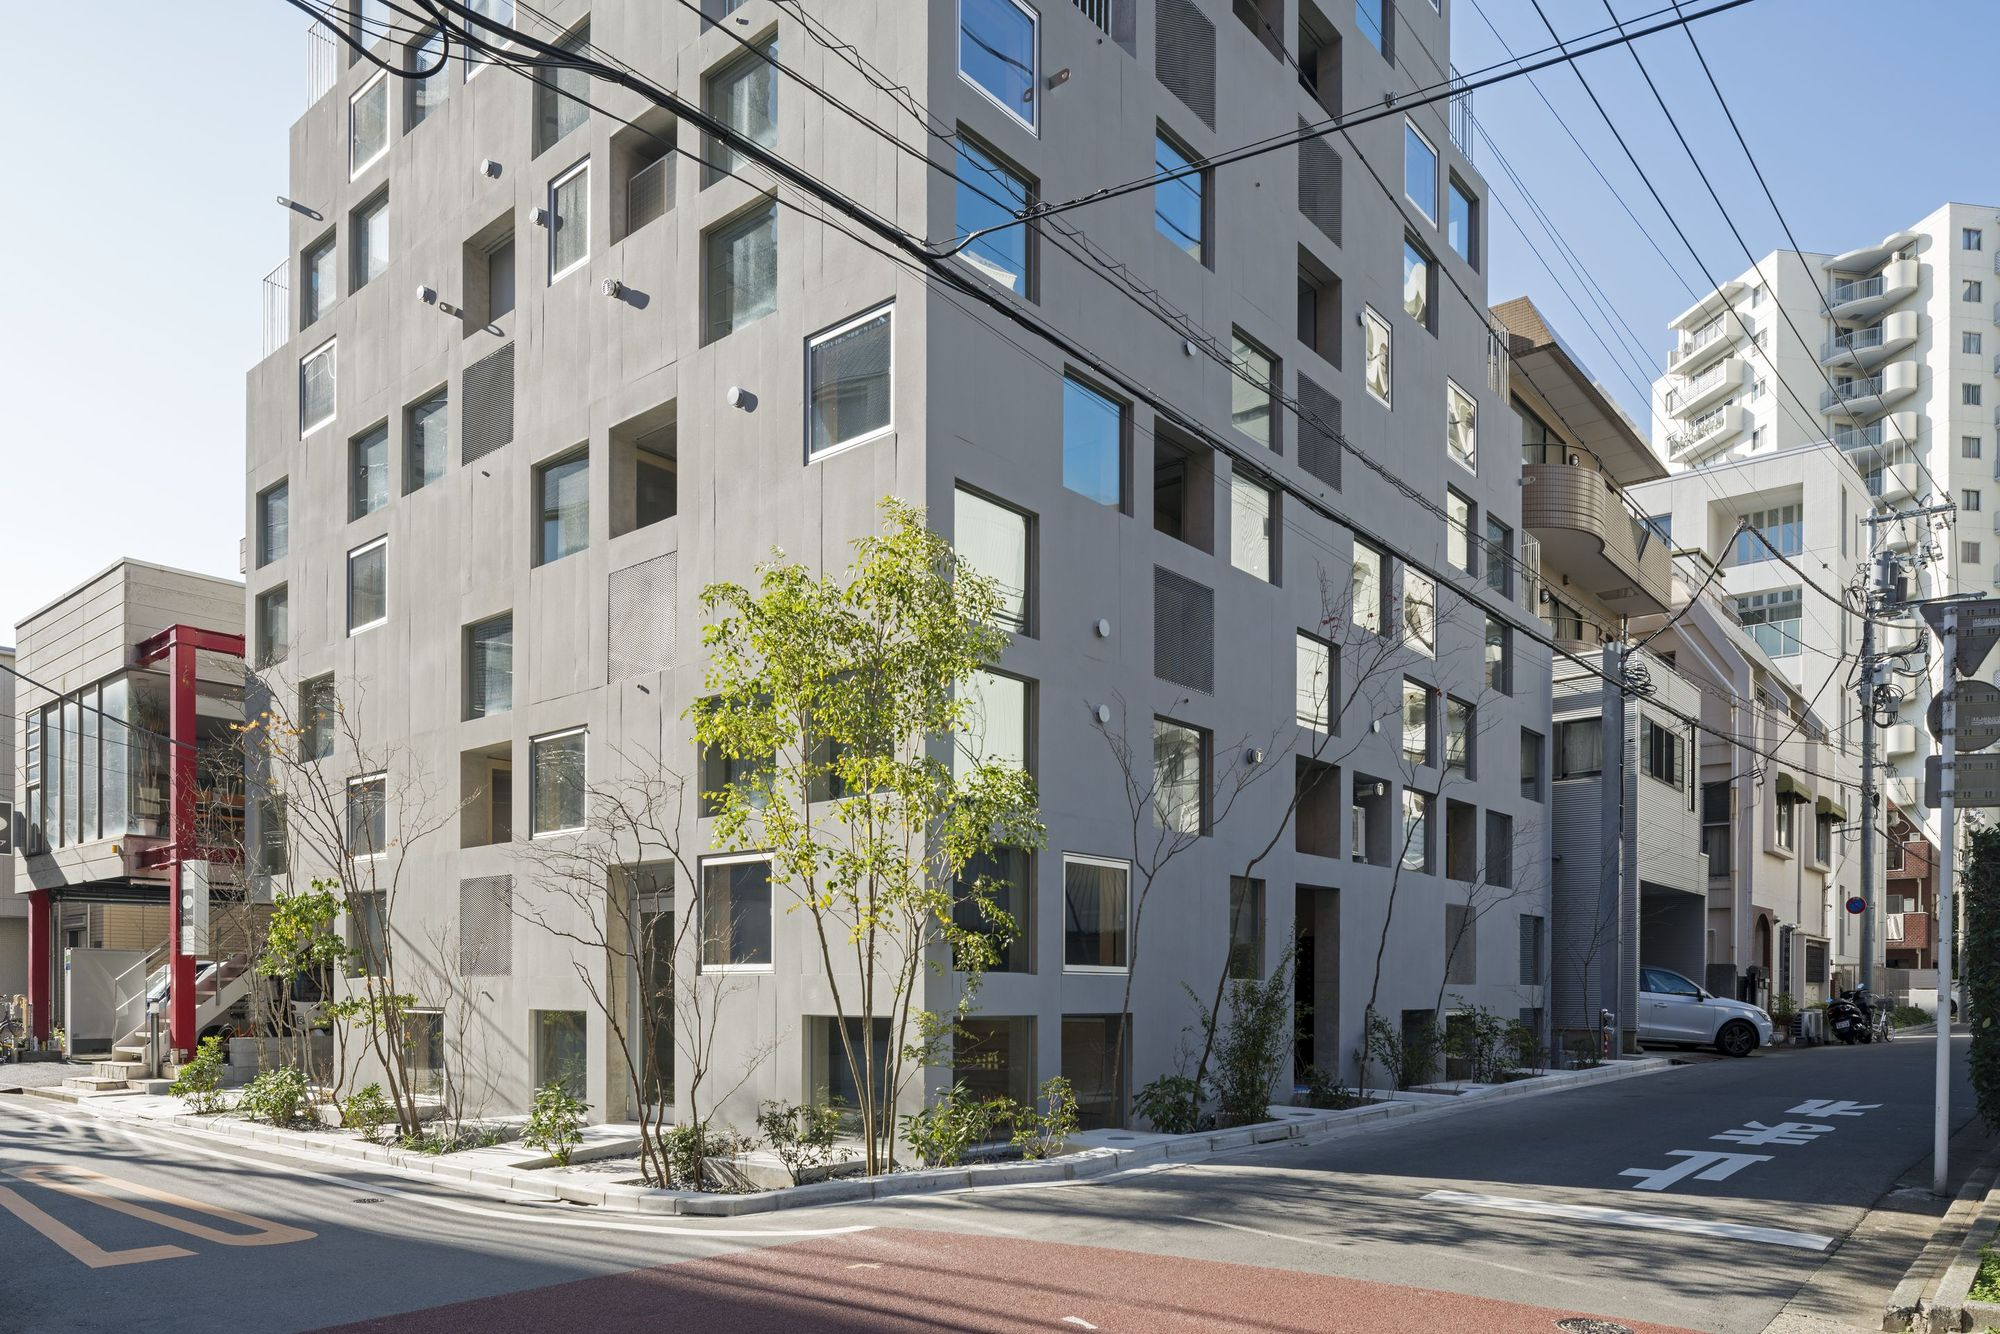 Hatsuse Mita Apartments / ihrmk